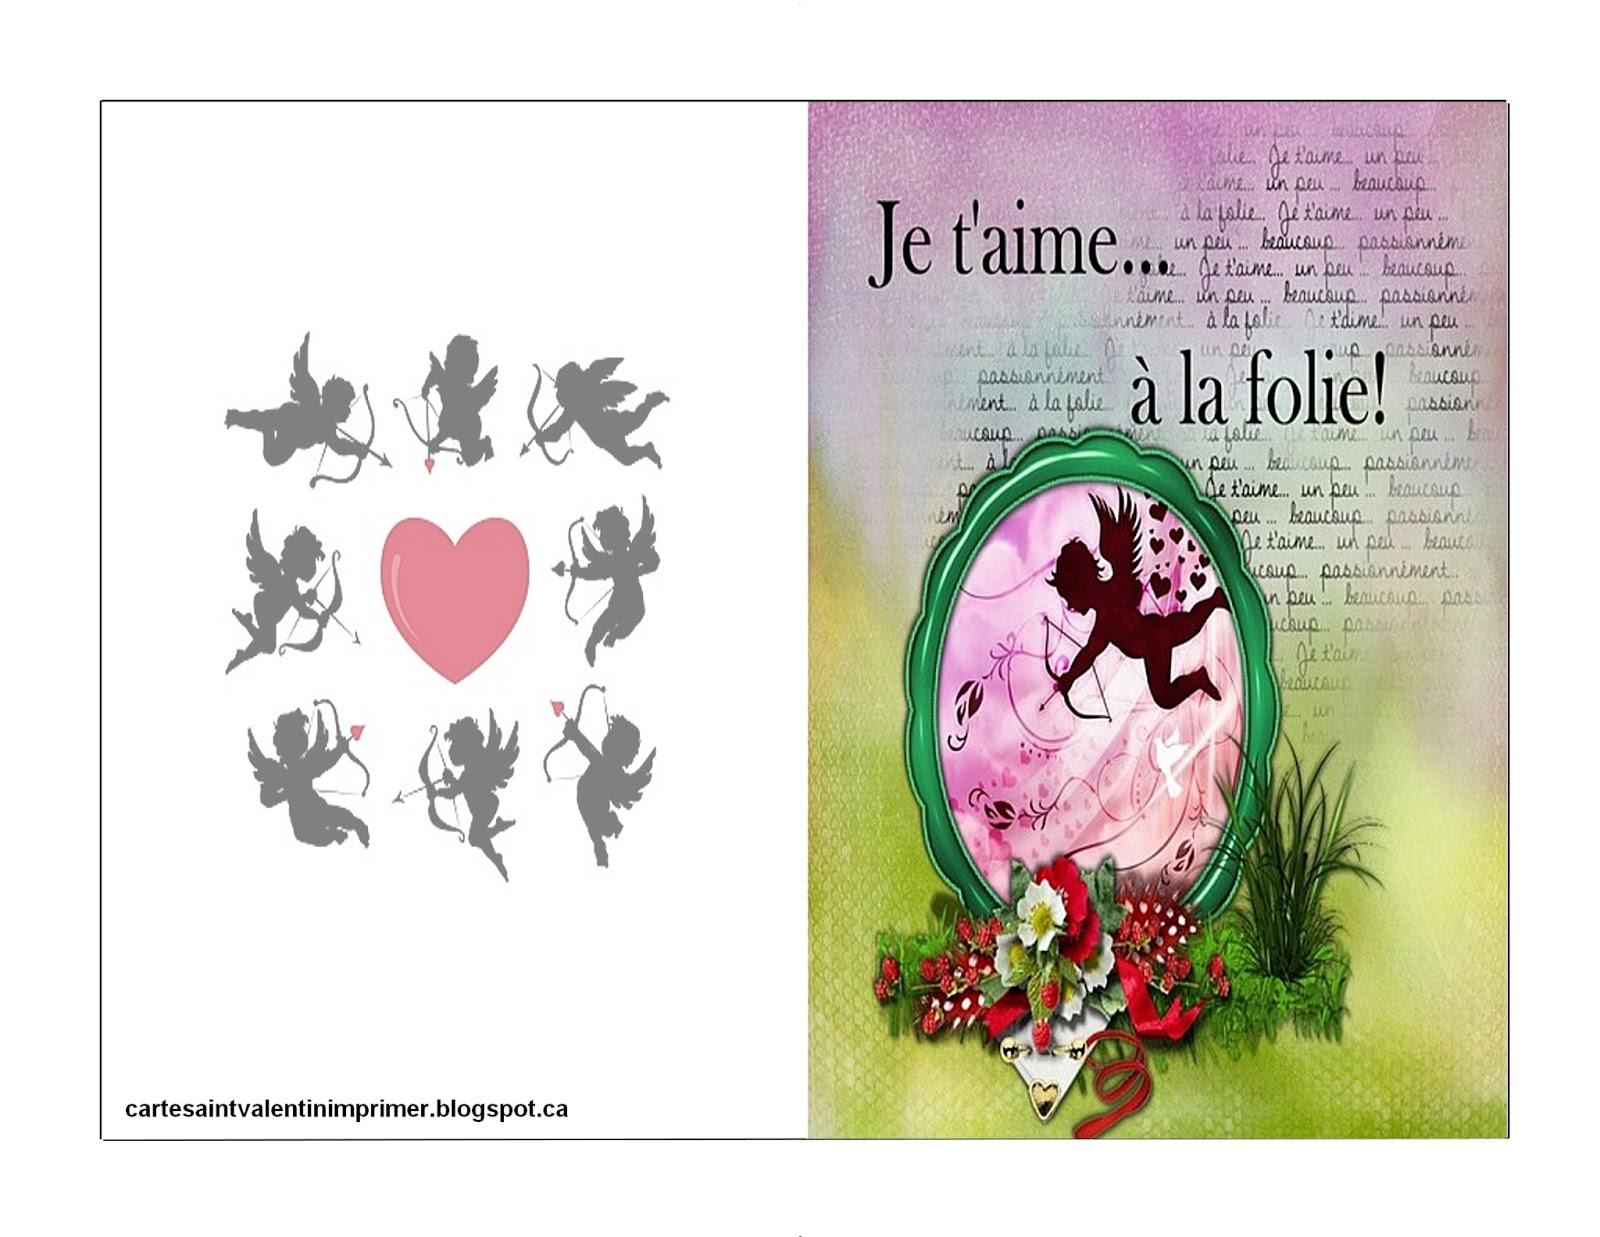 Carte saint valentin imprimer gratuite - Carte st valentin gratuite a imprimer ...